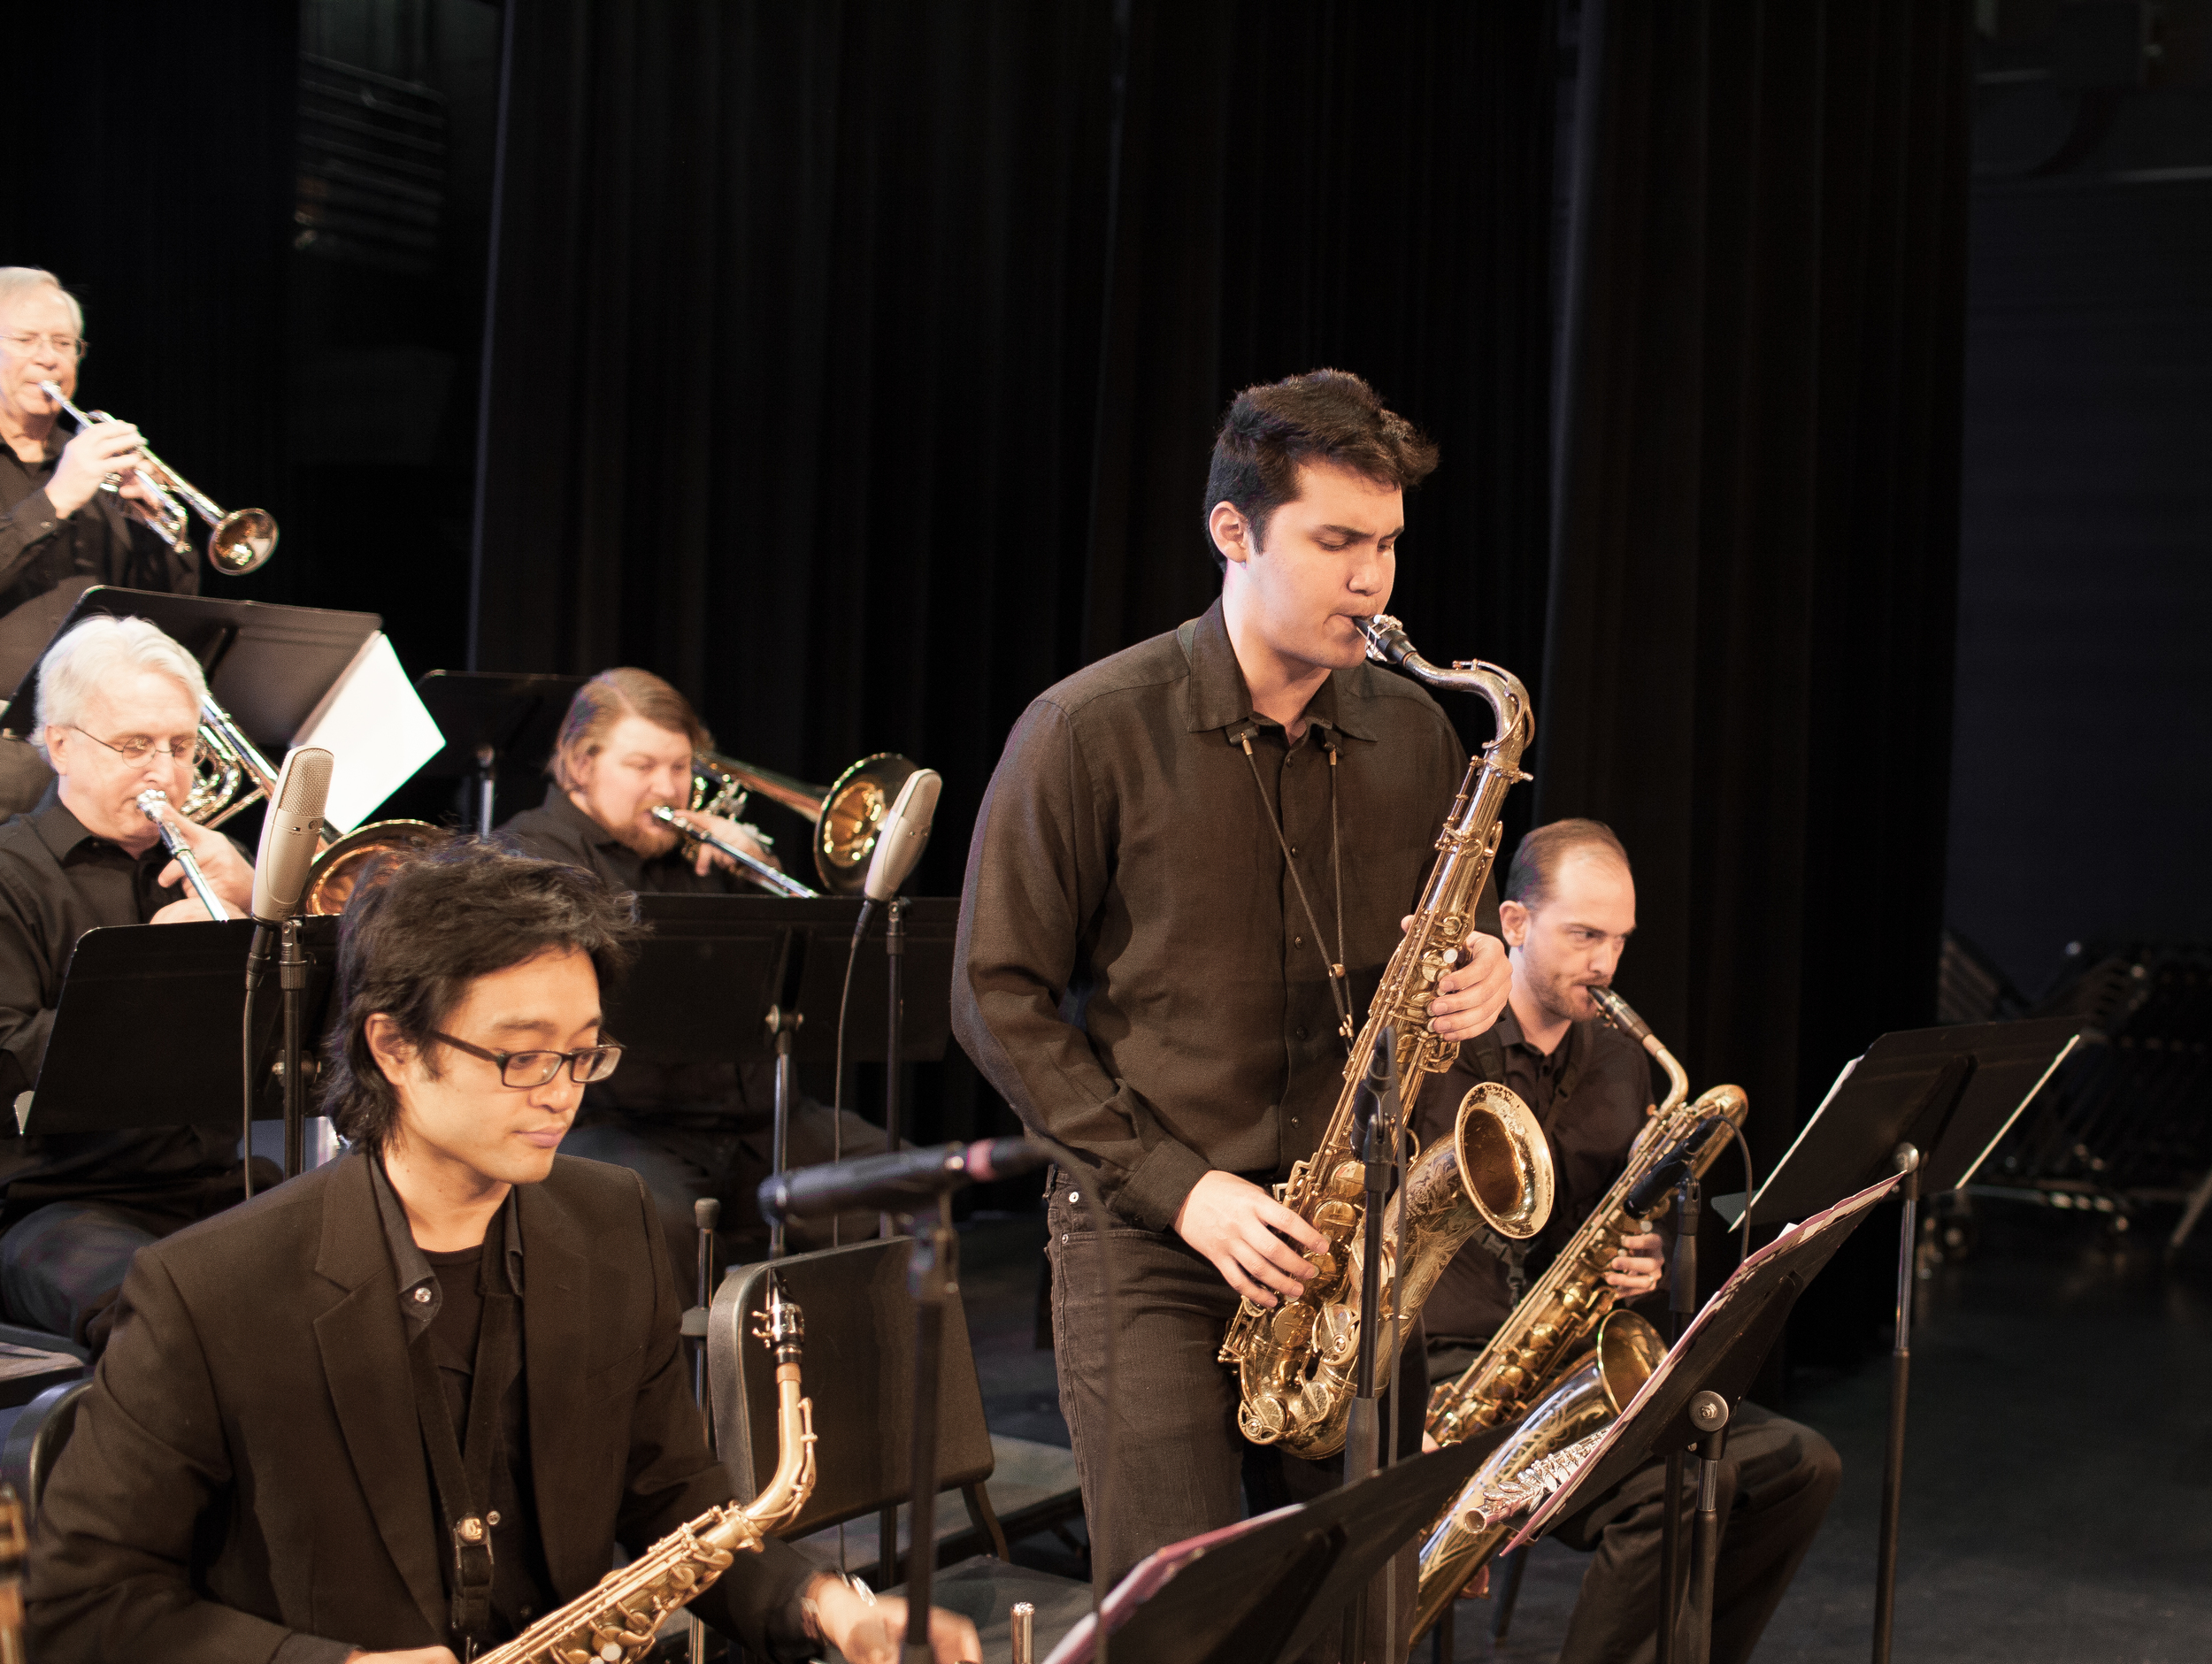 Eddie Pimentel, tenor saxophone